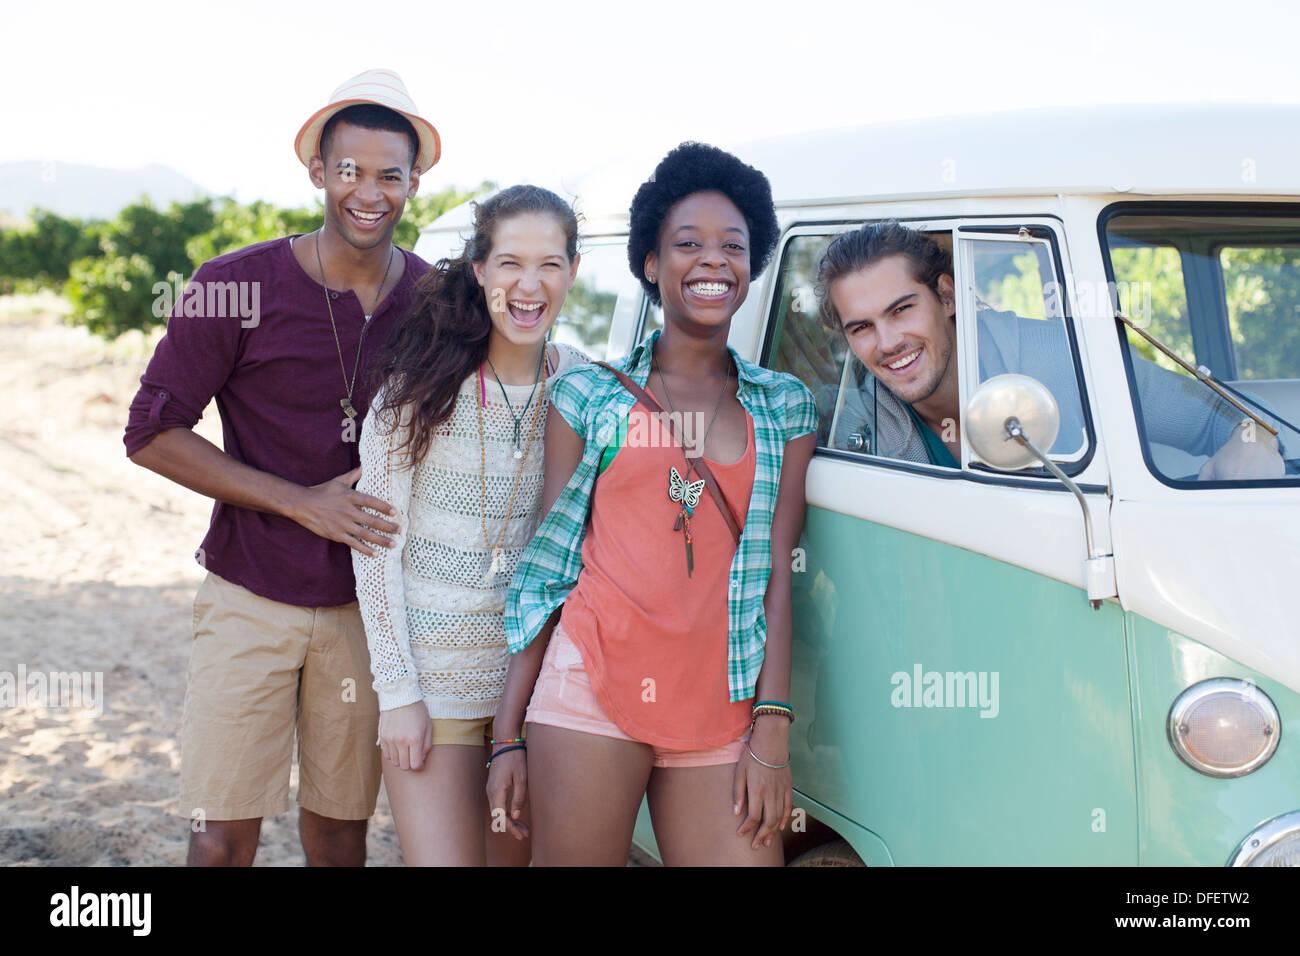 Friends laughing by camper van - Stock Image